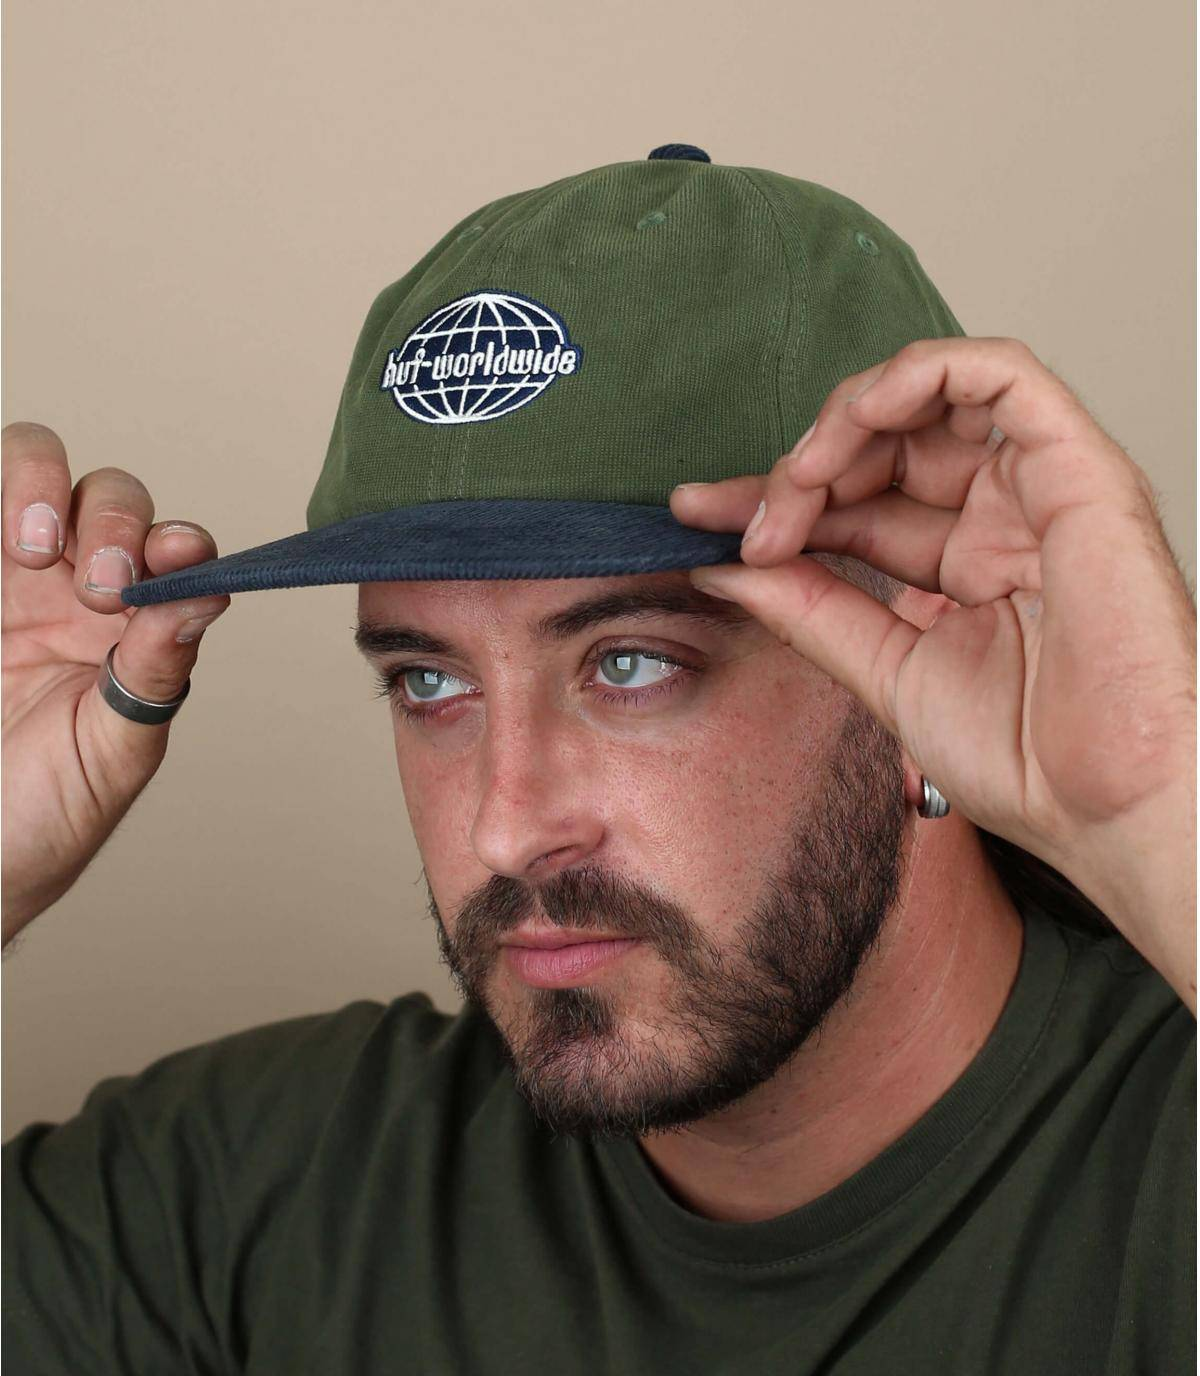 cappellino velluto Huf